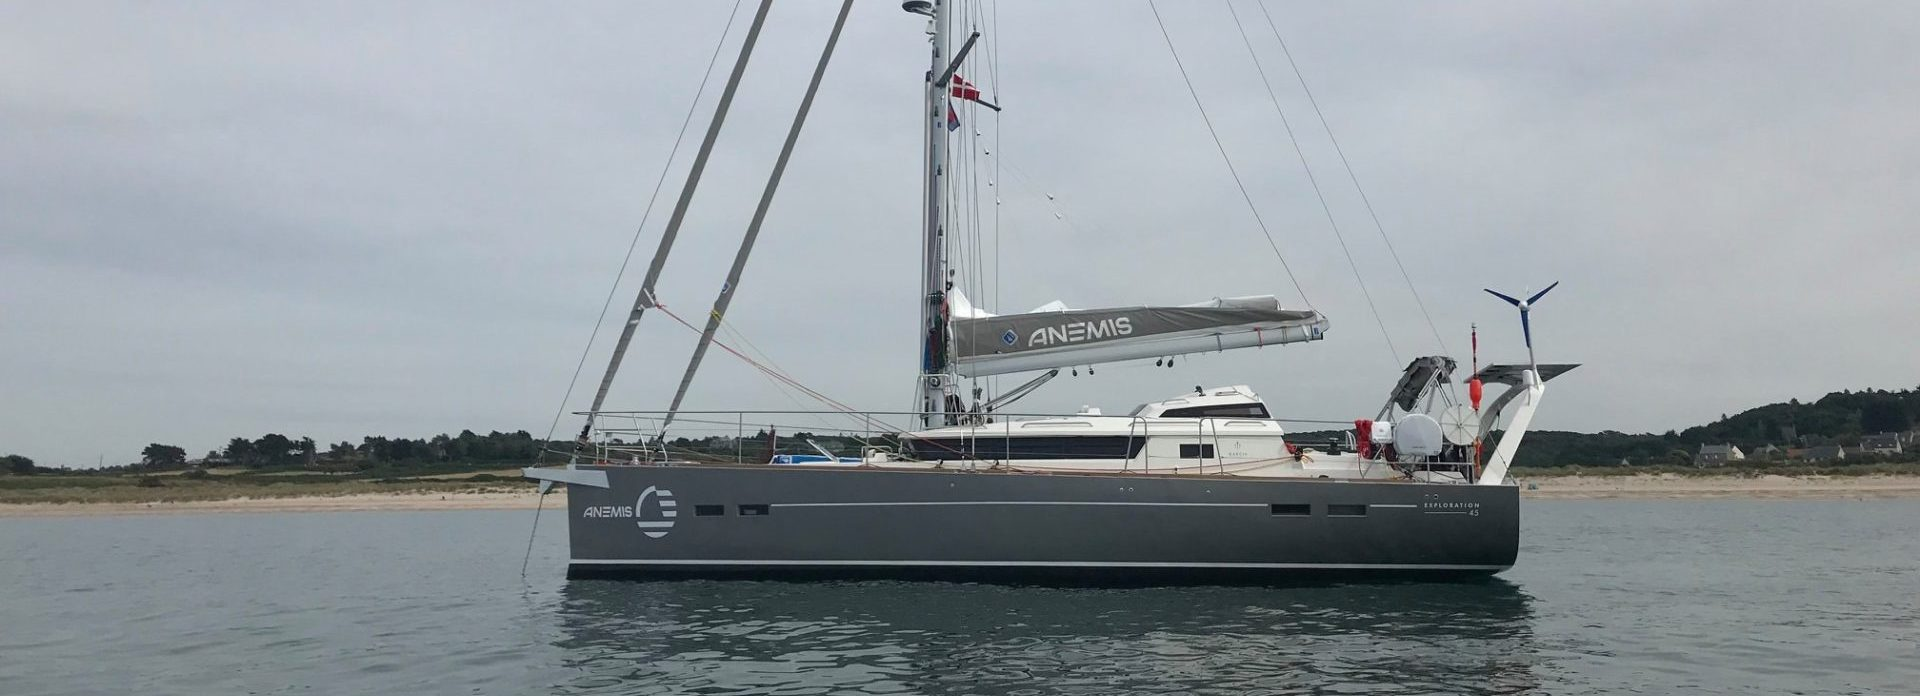 Anemis The Hybrid Propulsion Exploration 45 Garcia Yachts